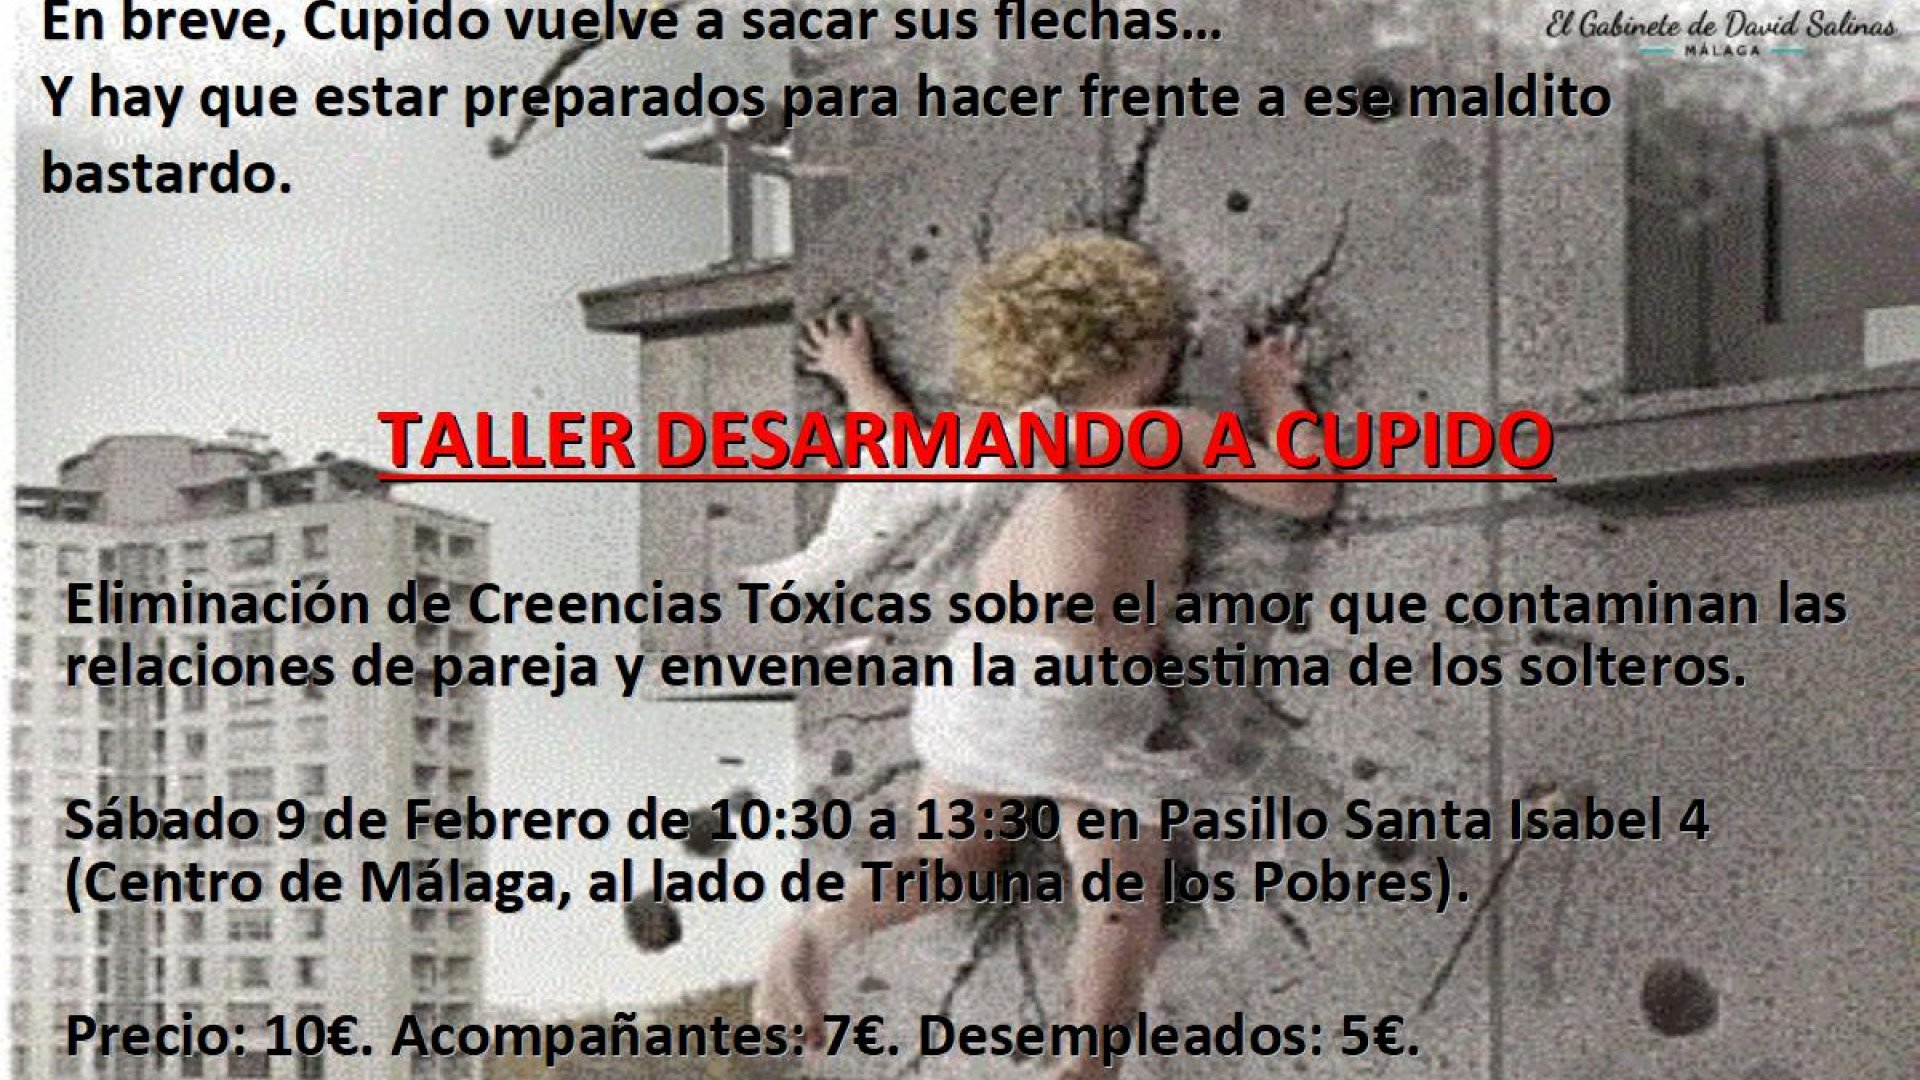 TALLER DESARMANDO A CUPIDO